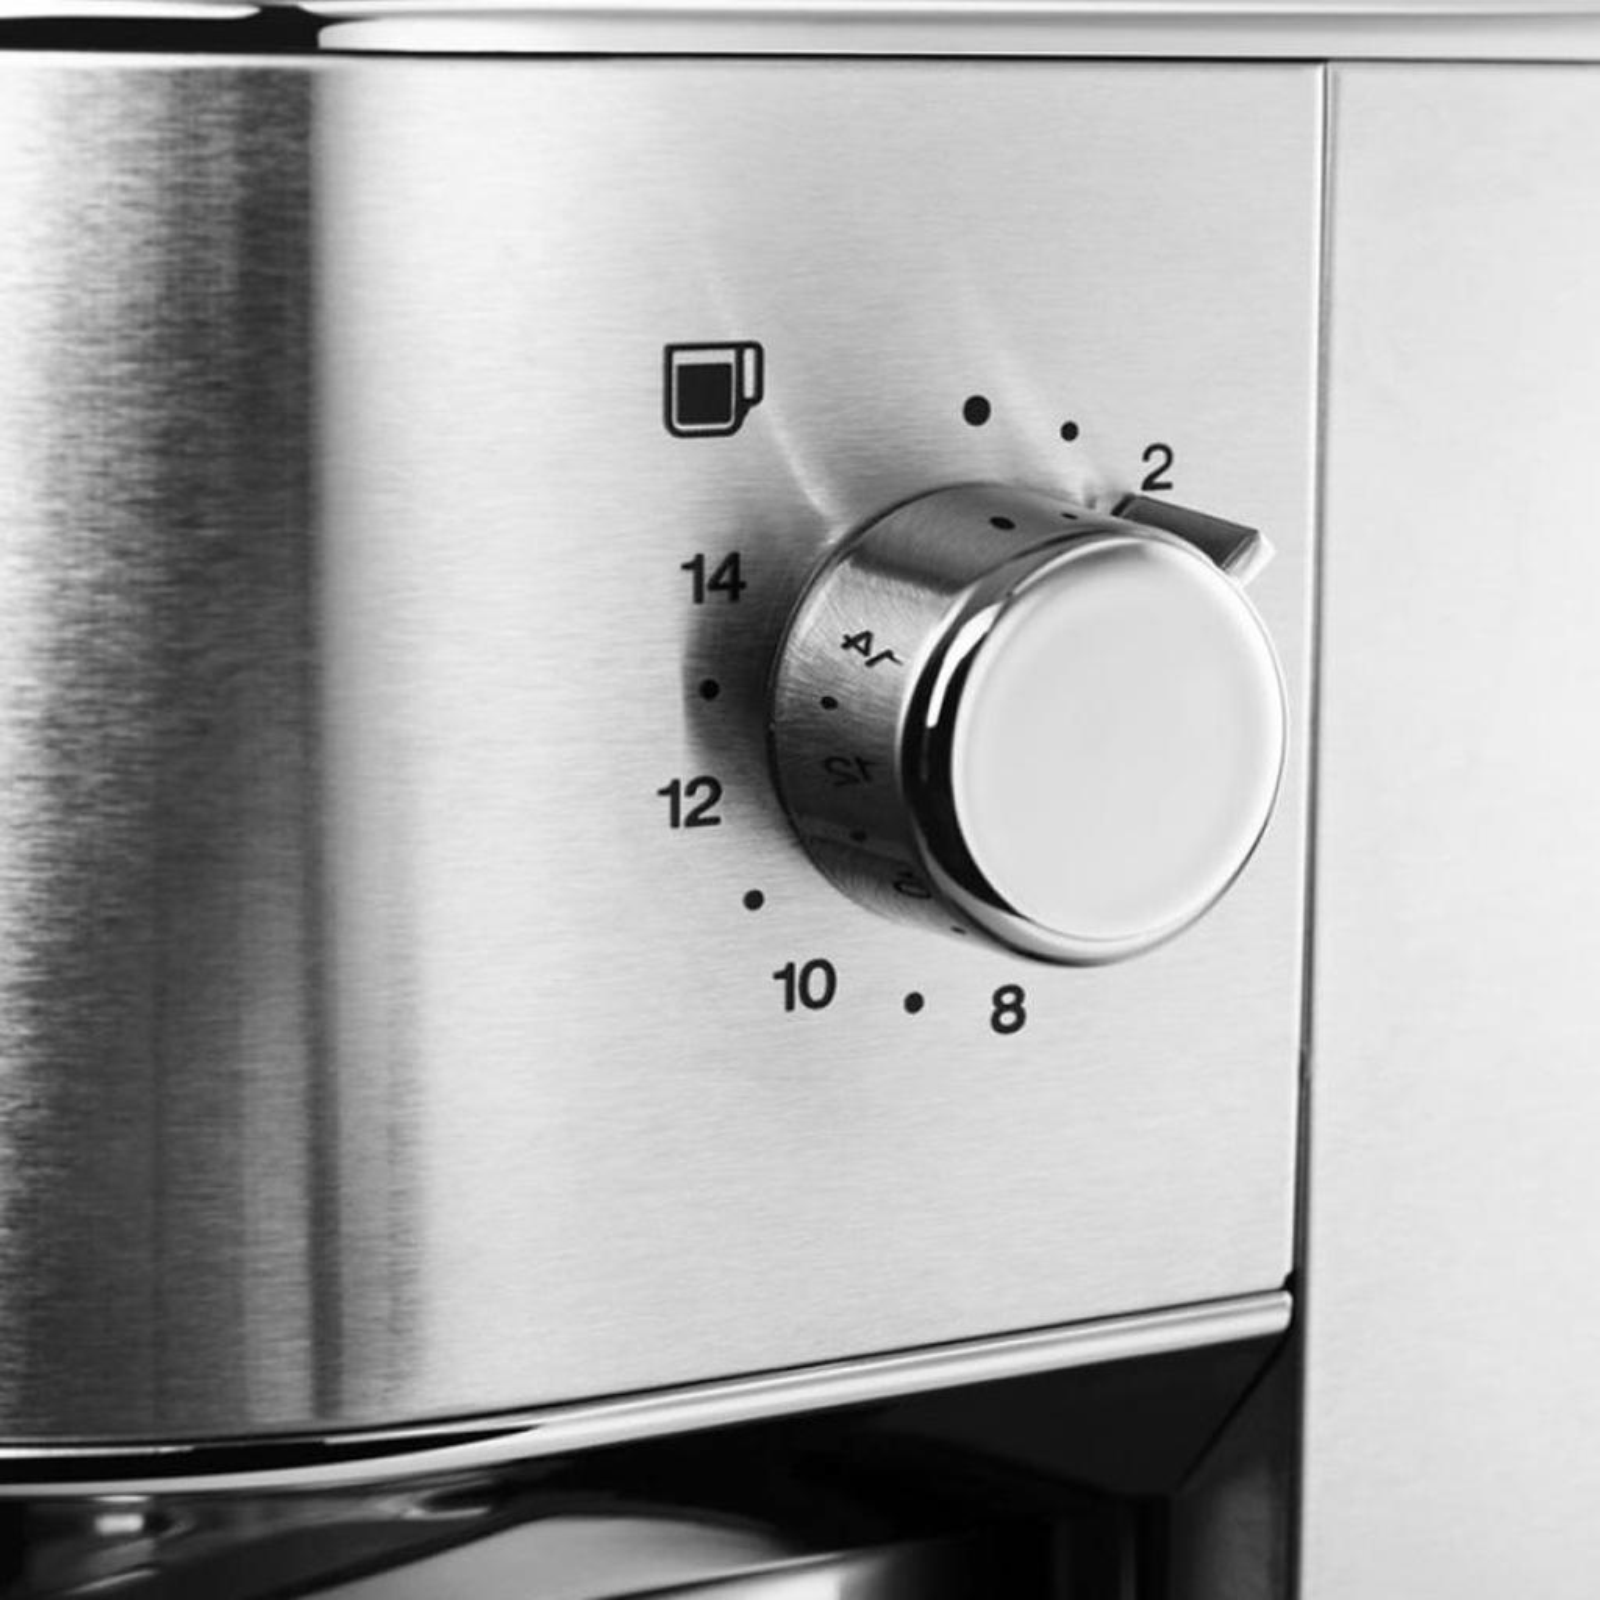 Кофемолка DeLonghi KG 520 M изображение 5